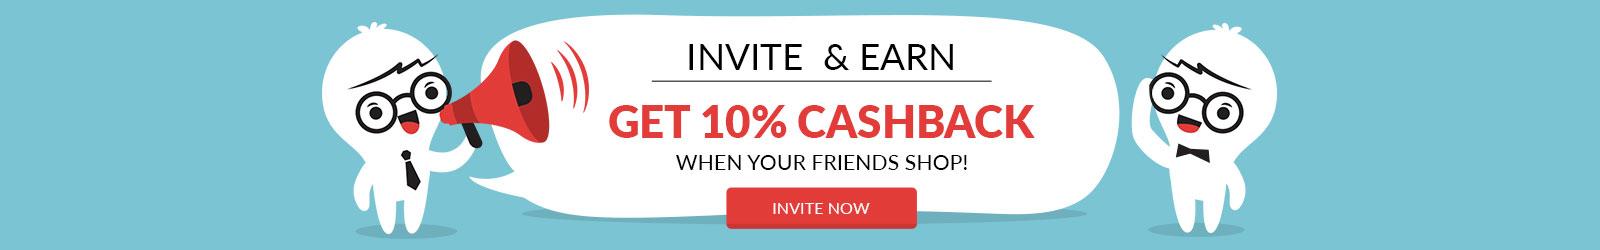 Invites & Earn